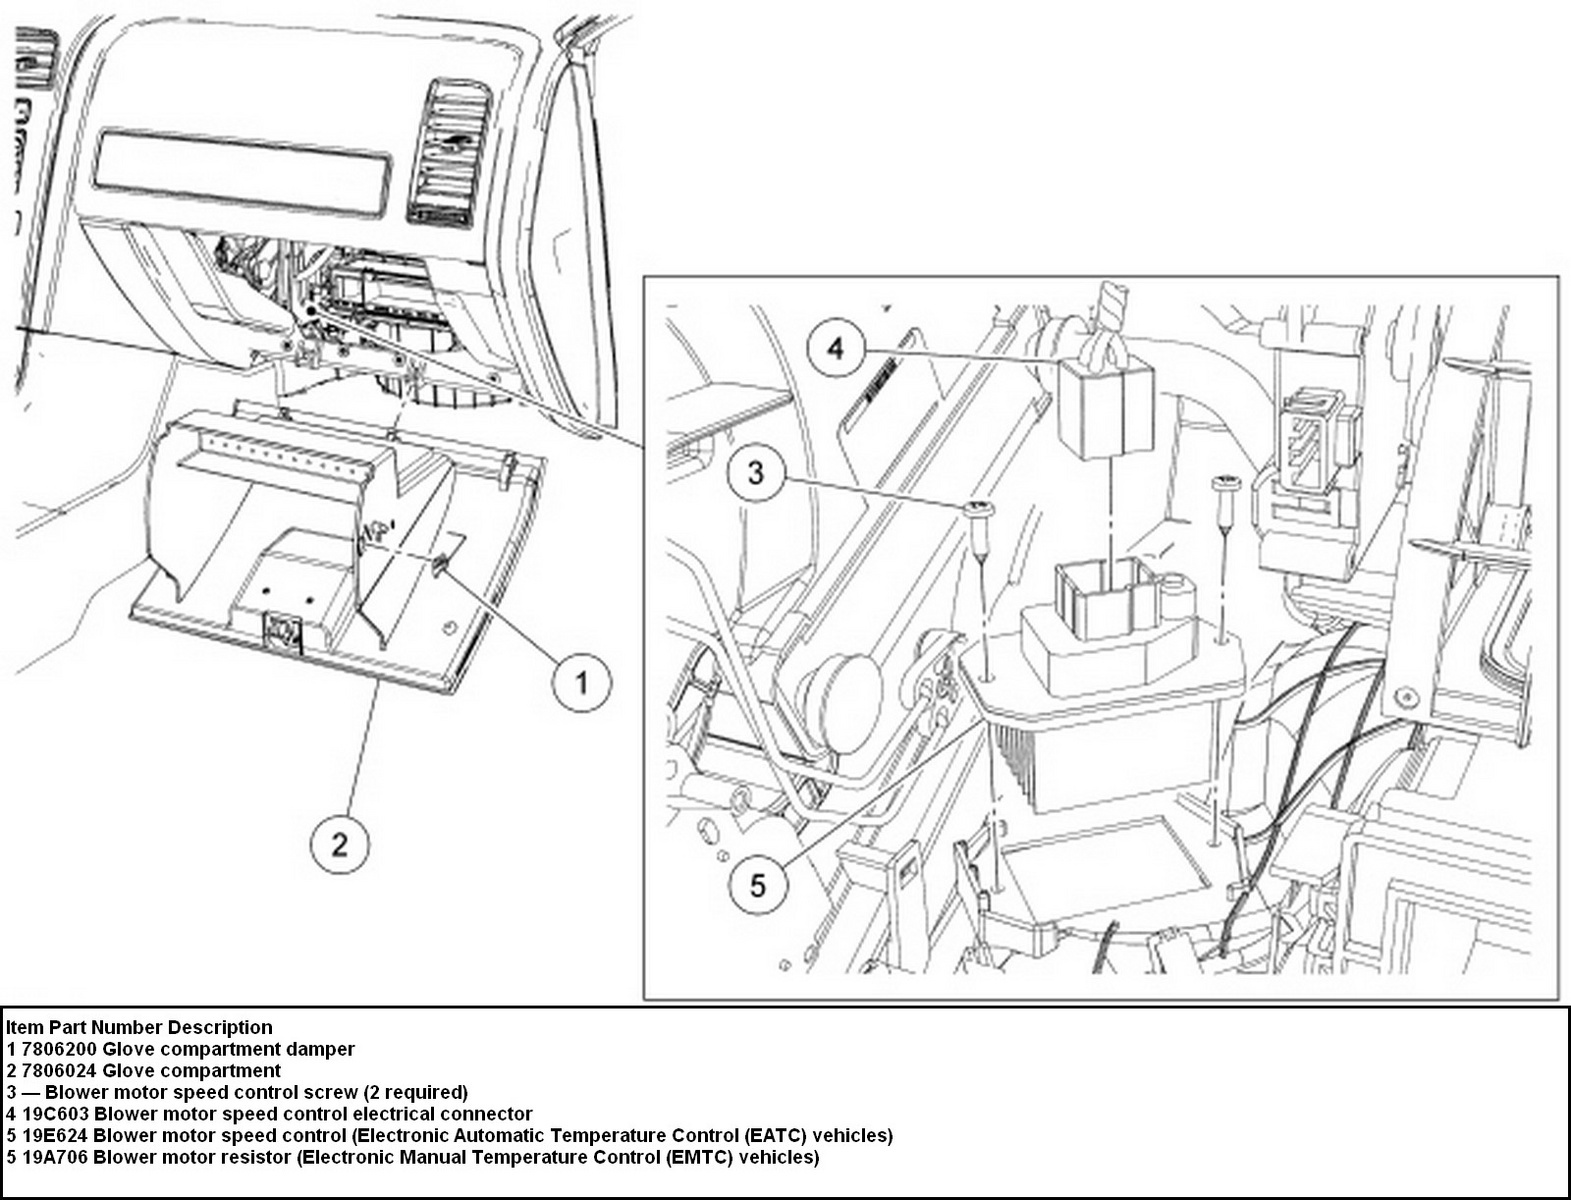 3 Speed Wiper Motor Wiring Diagram  Auto Electrical